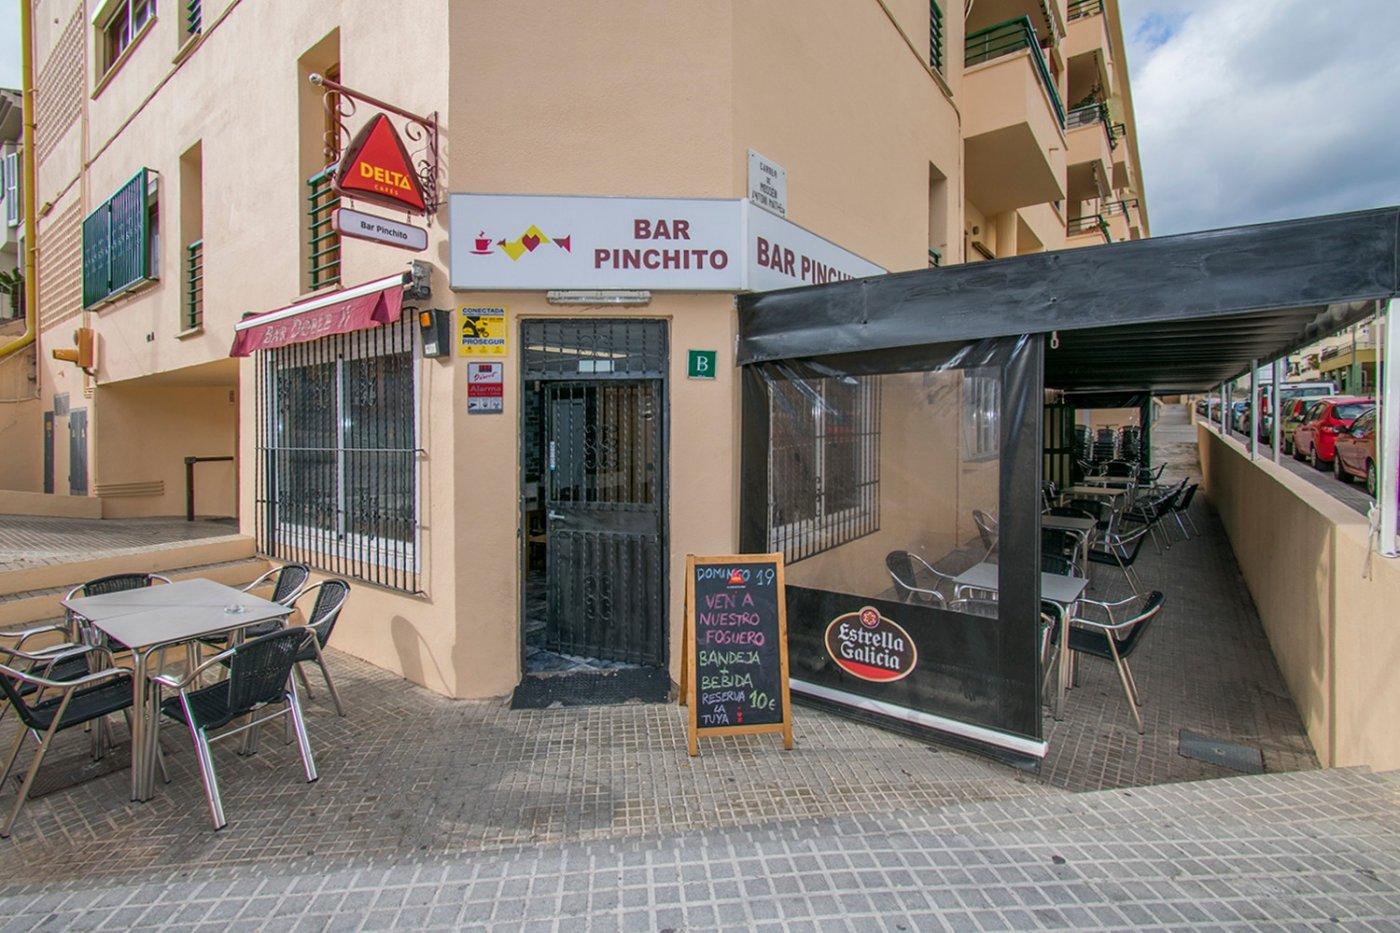 Traspaso Local Comercial  Palma de mallorca ,son serra - la vileta. Bar-cafetería totalmente reformado y equipado con terraza.